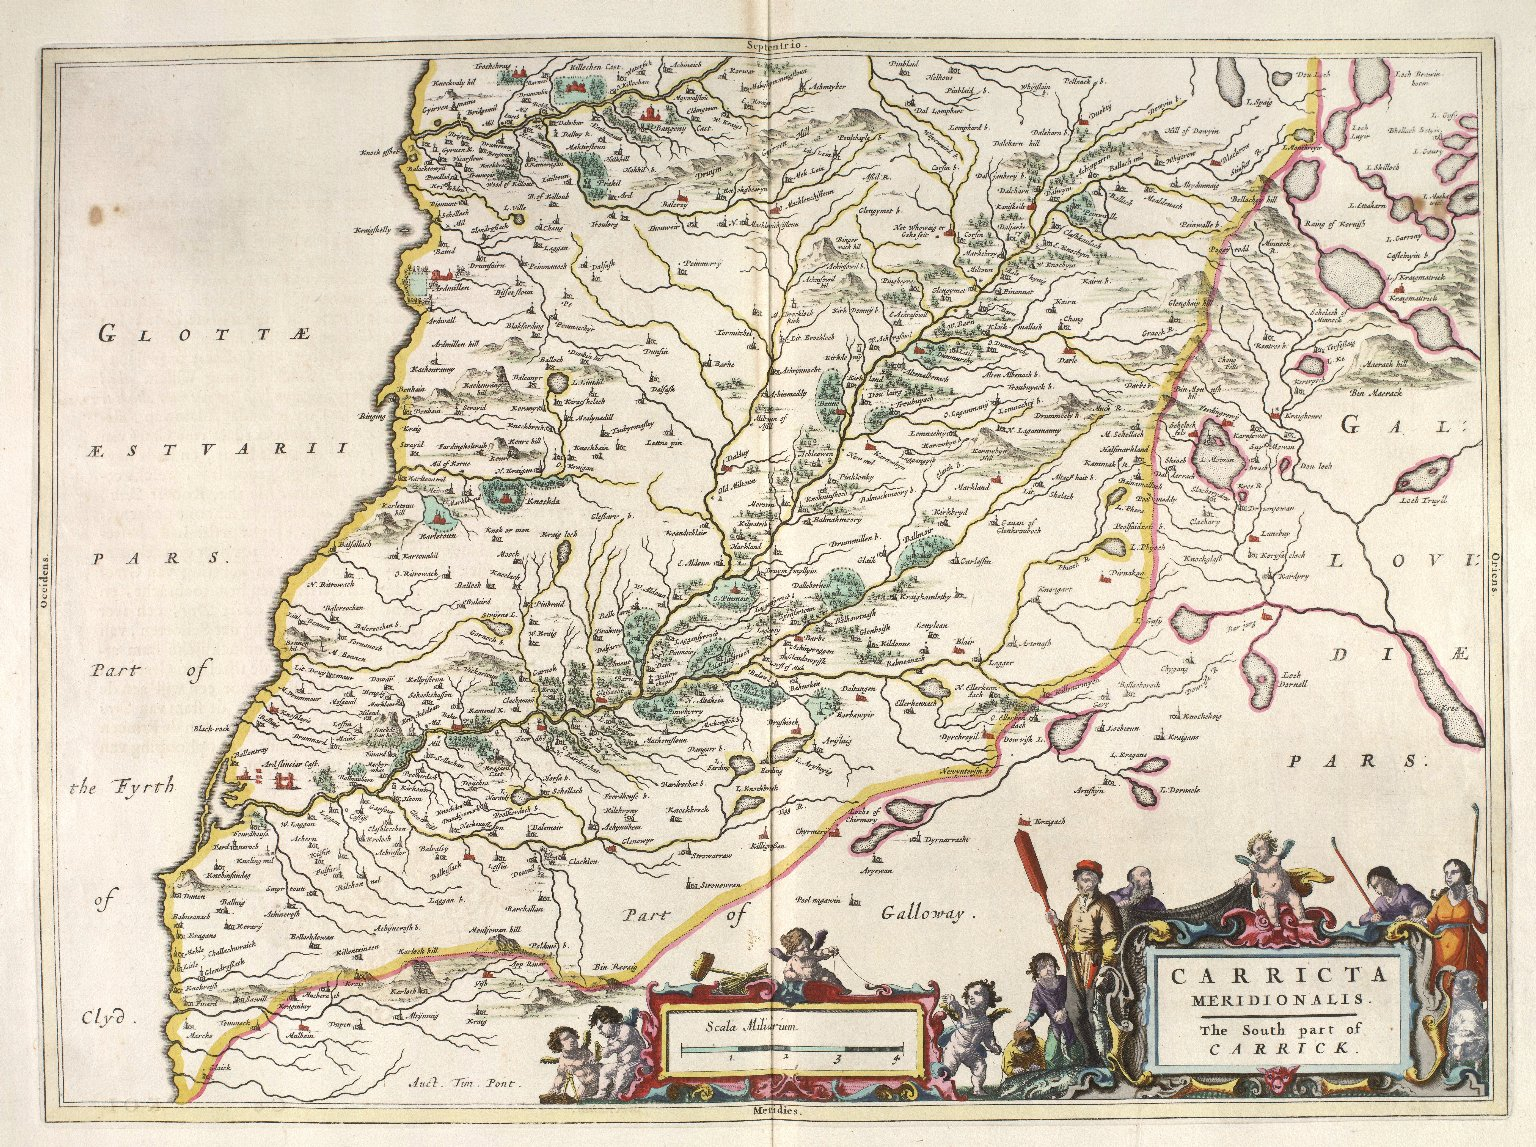 [Geographiae Blavianae] [Also known as: Atlas major] [059 of 153]